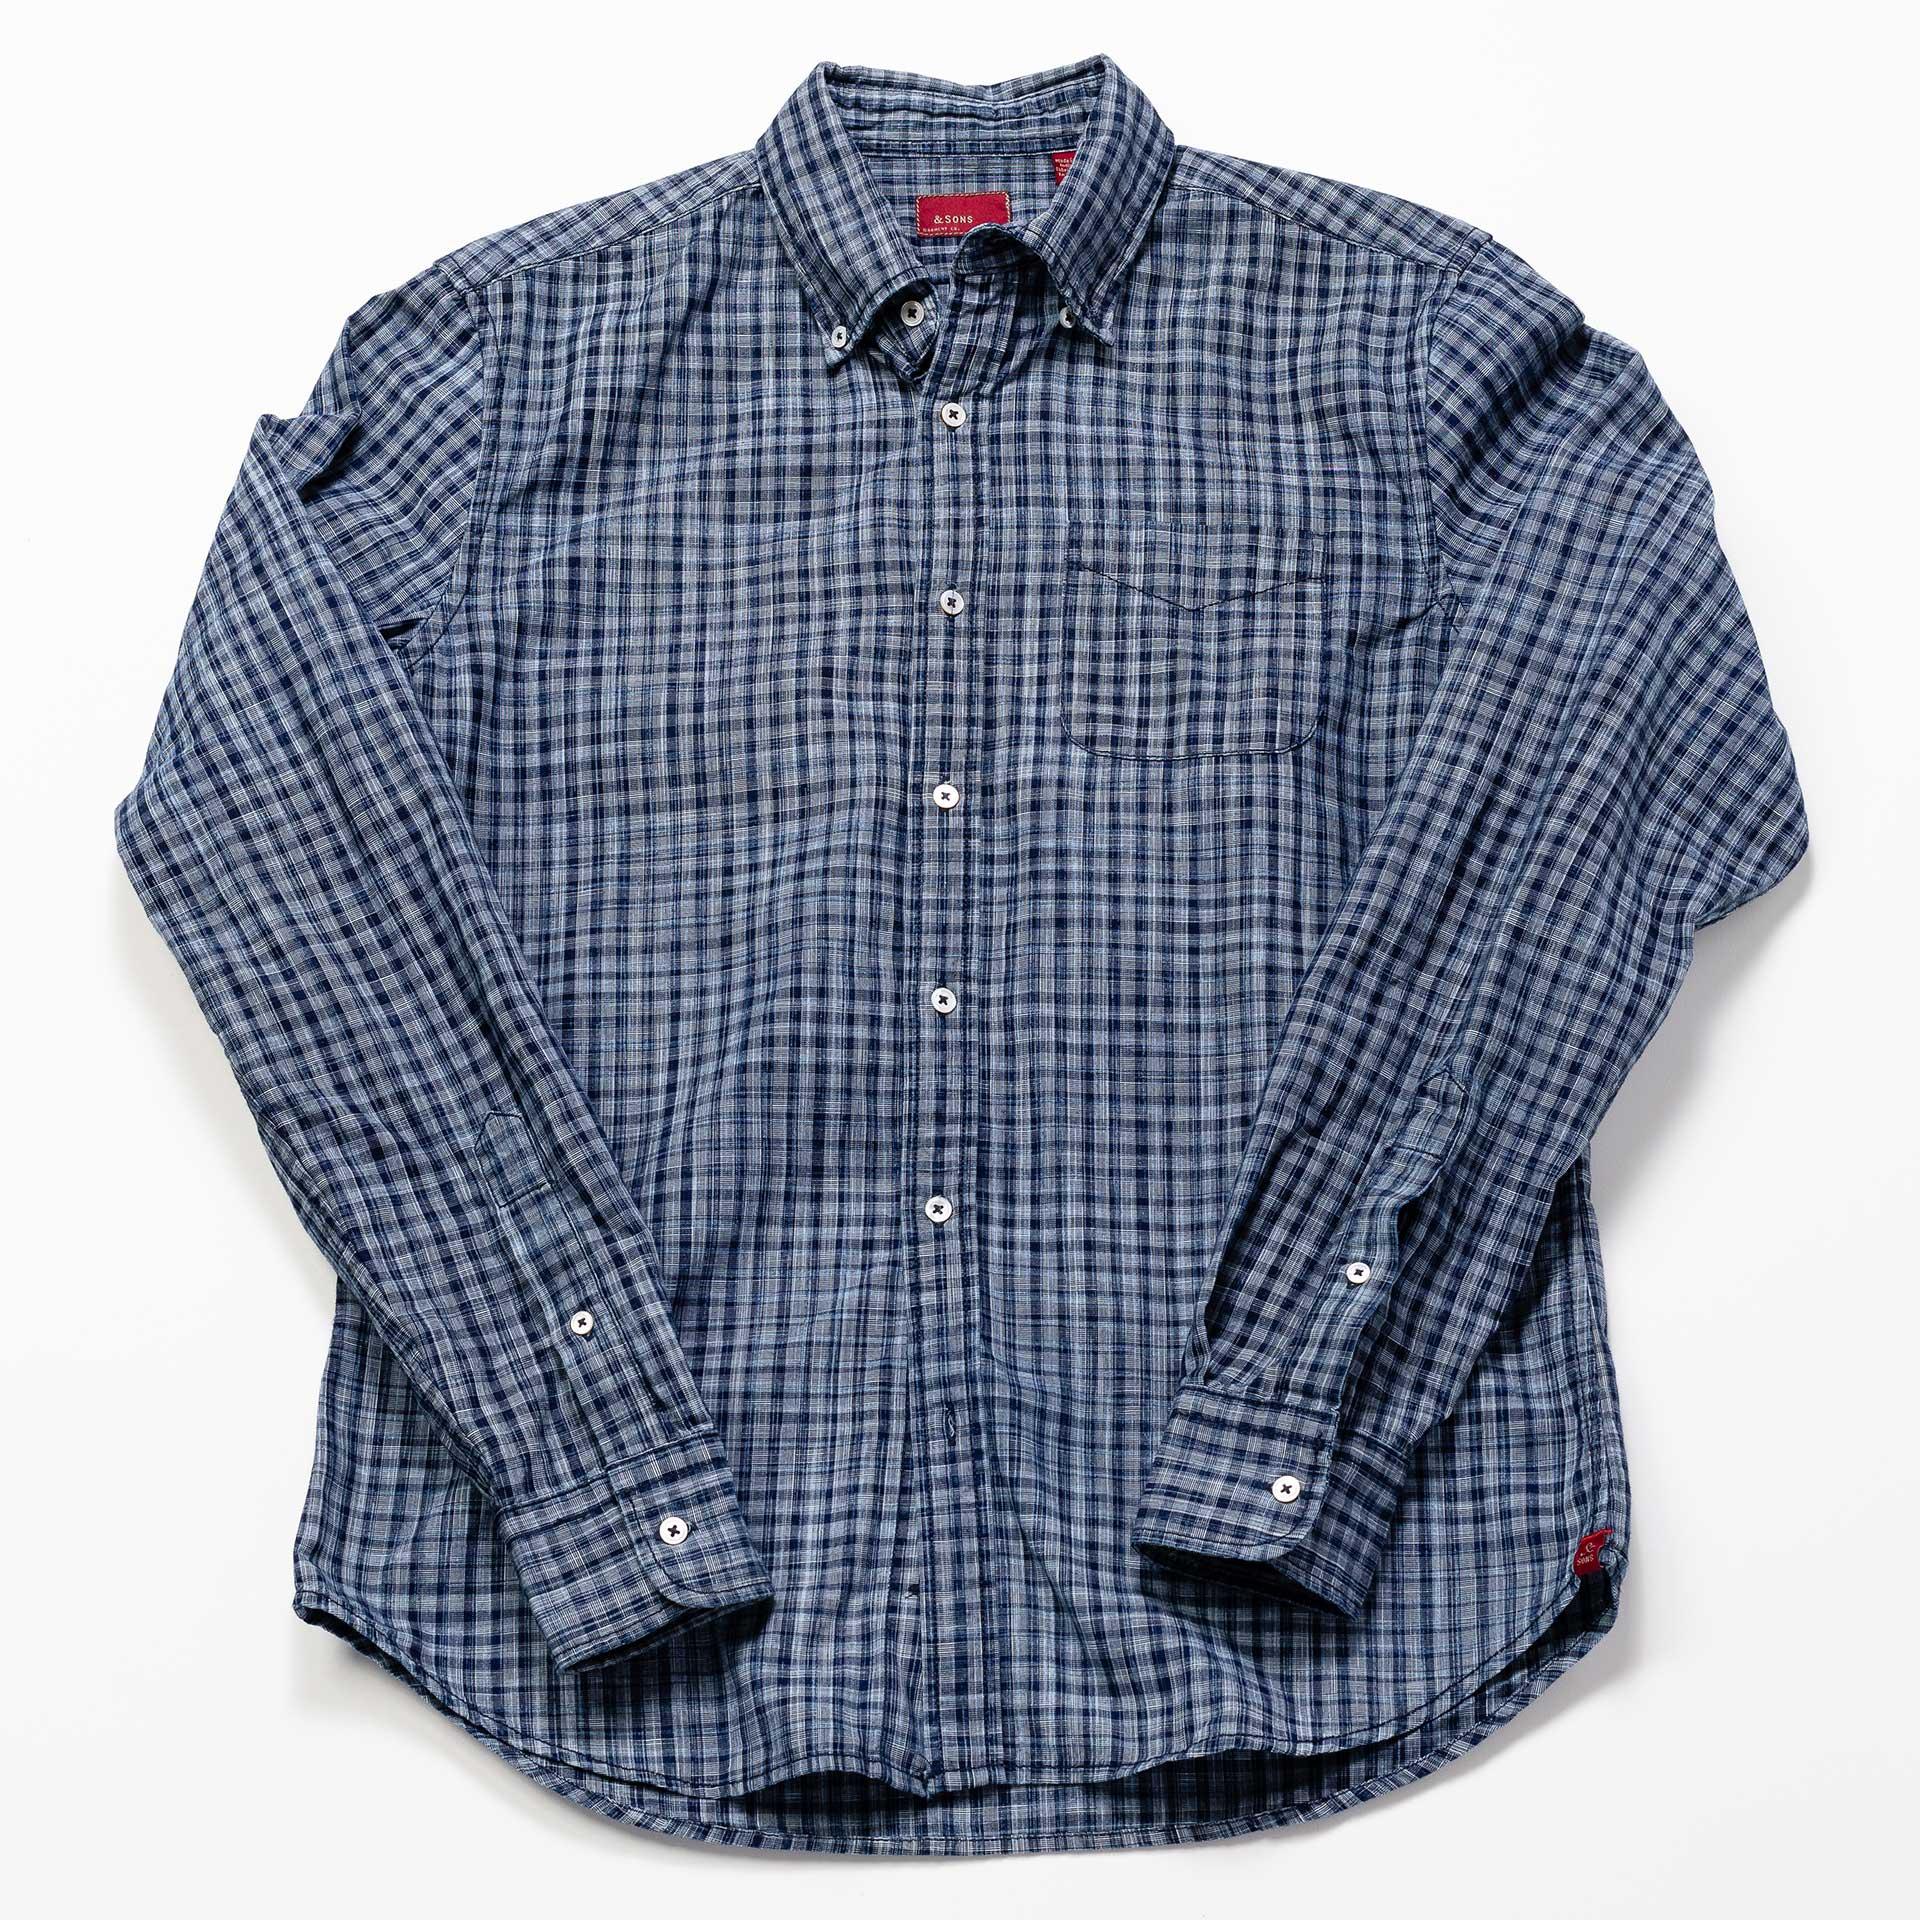 &-Sons-Garment-Co-Checkers-Shirt